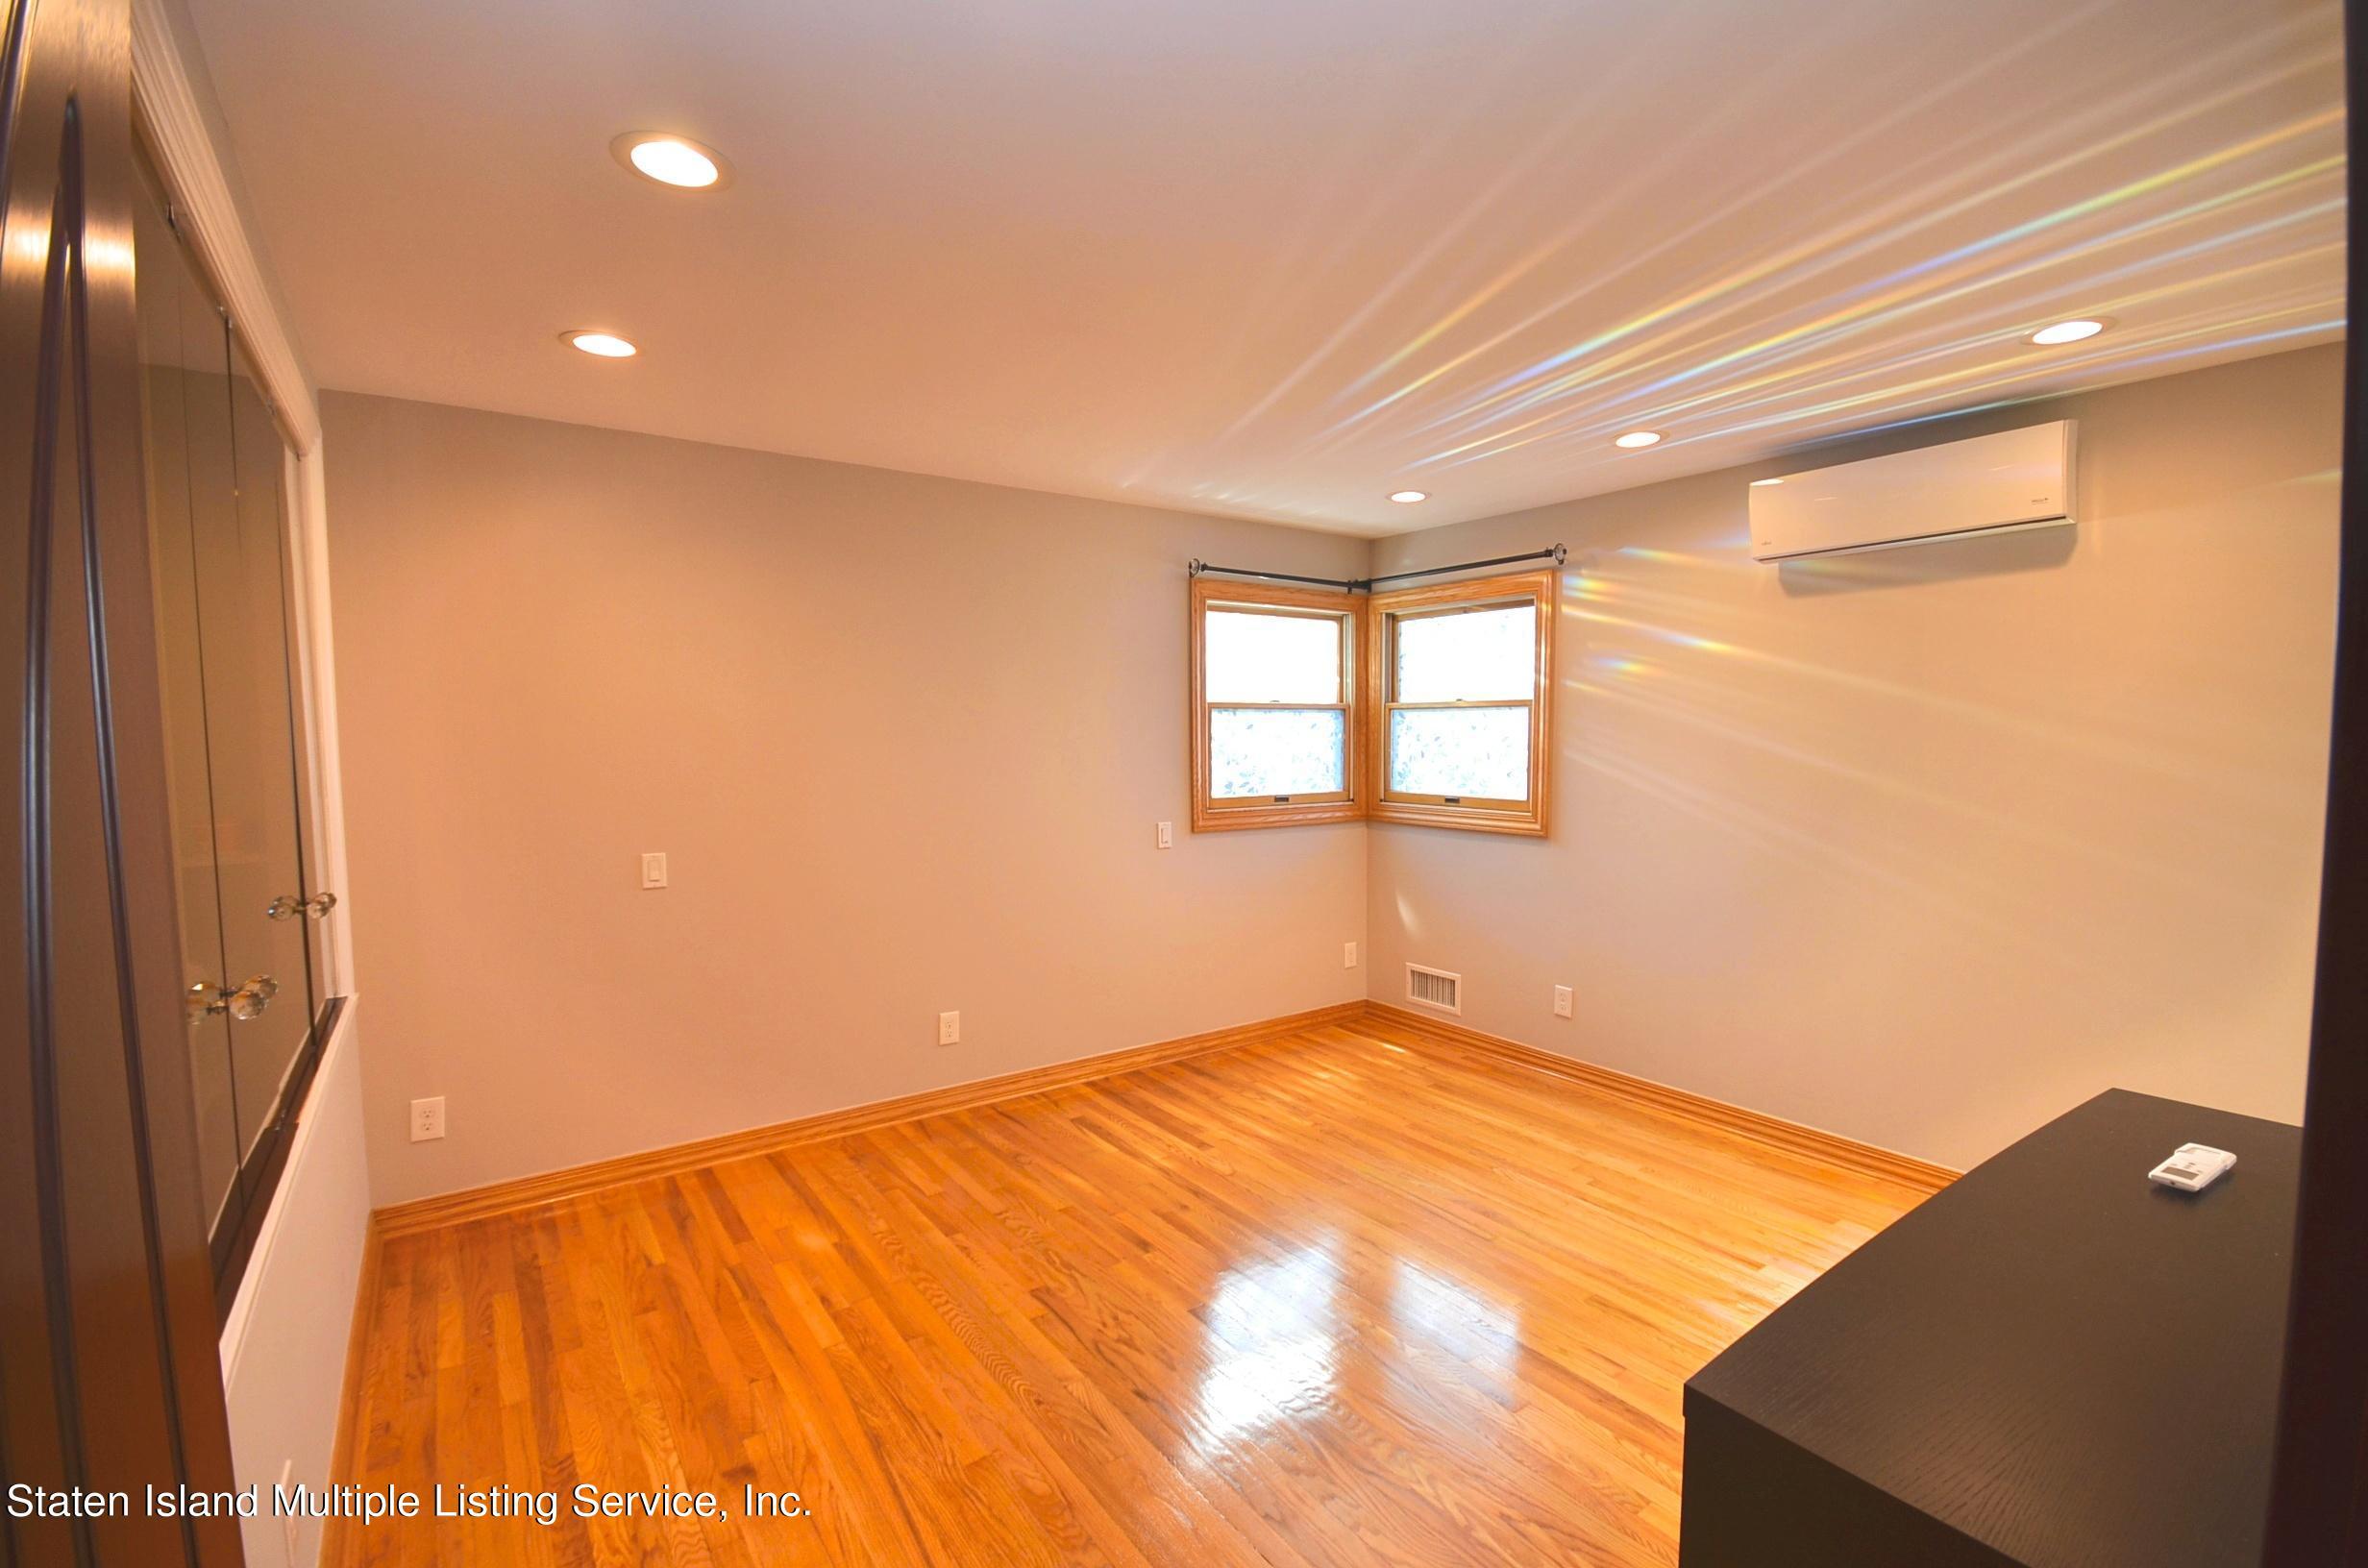 Single Family - Detached 48 Ocean Terrace  Staten Island, NY 10314, MLS-1142240-16